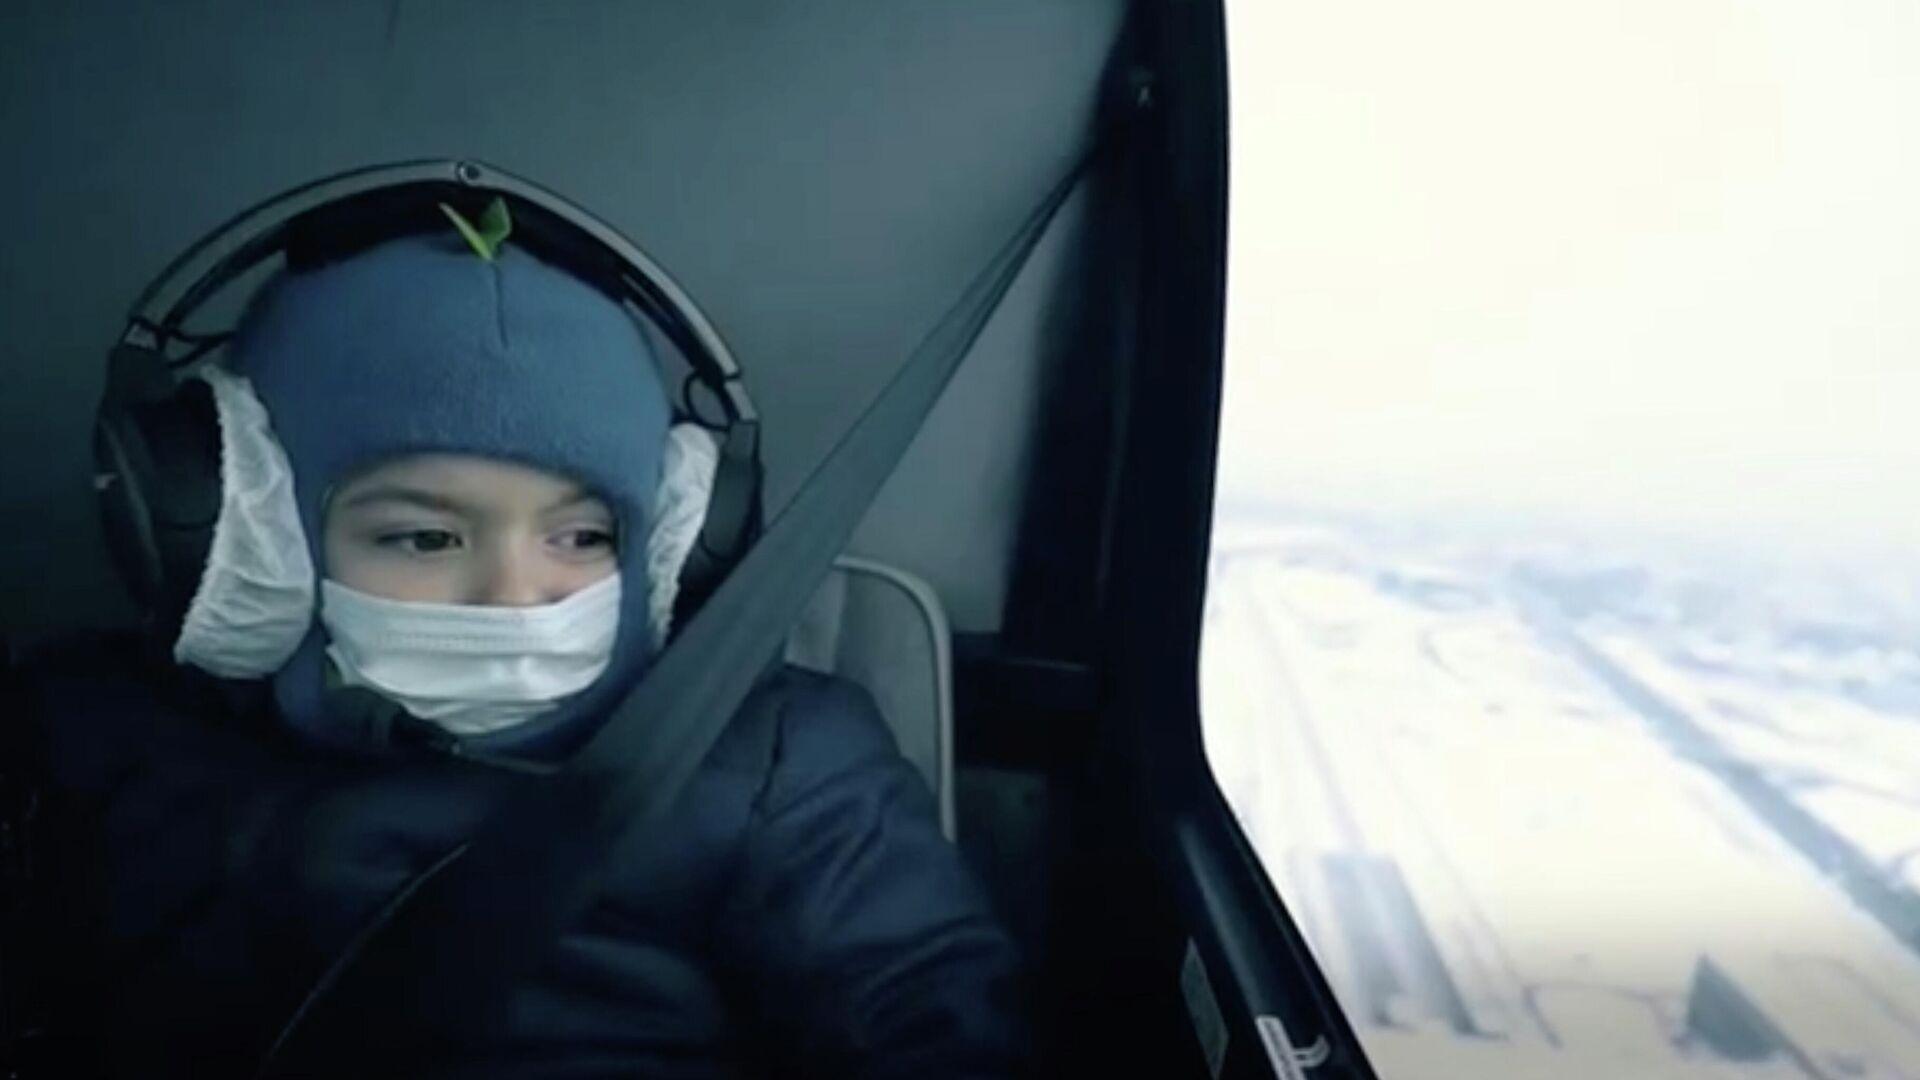 Пятилетний Марк во время полета на вертолете. Стоп-кадр видео - РИА Новости, 1920, 15.01.2021